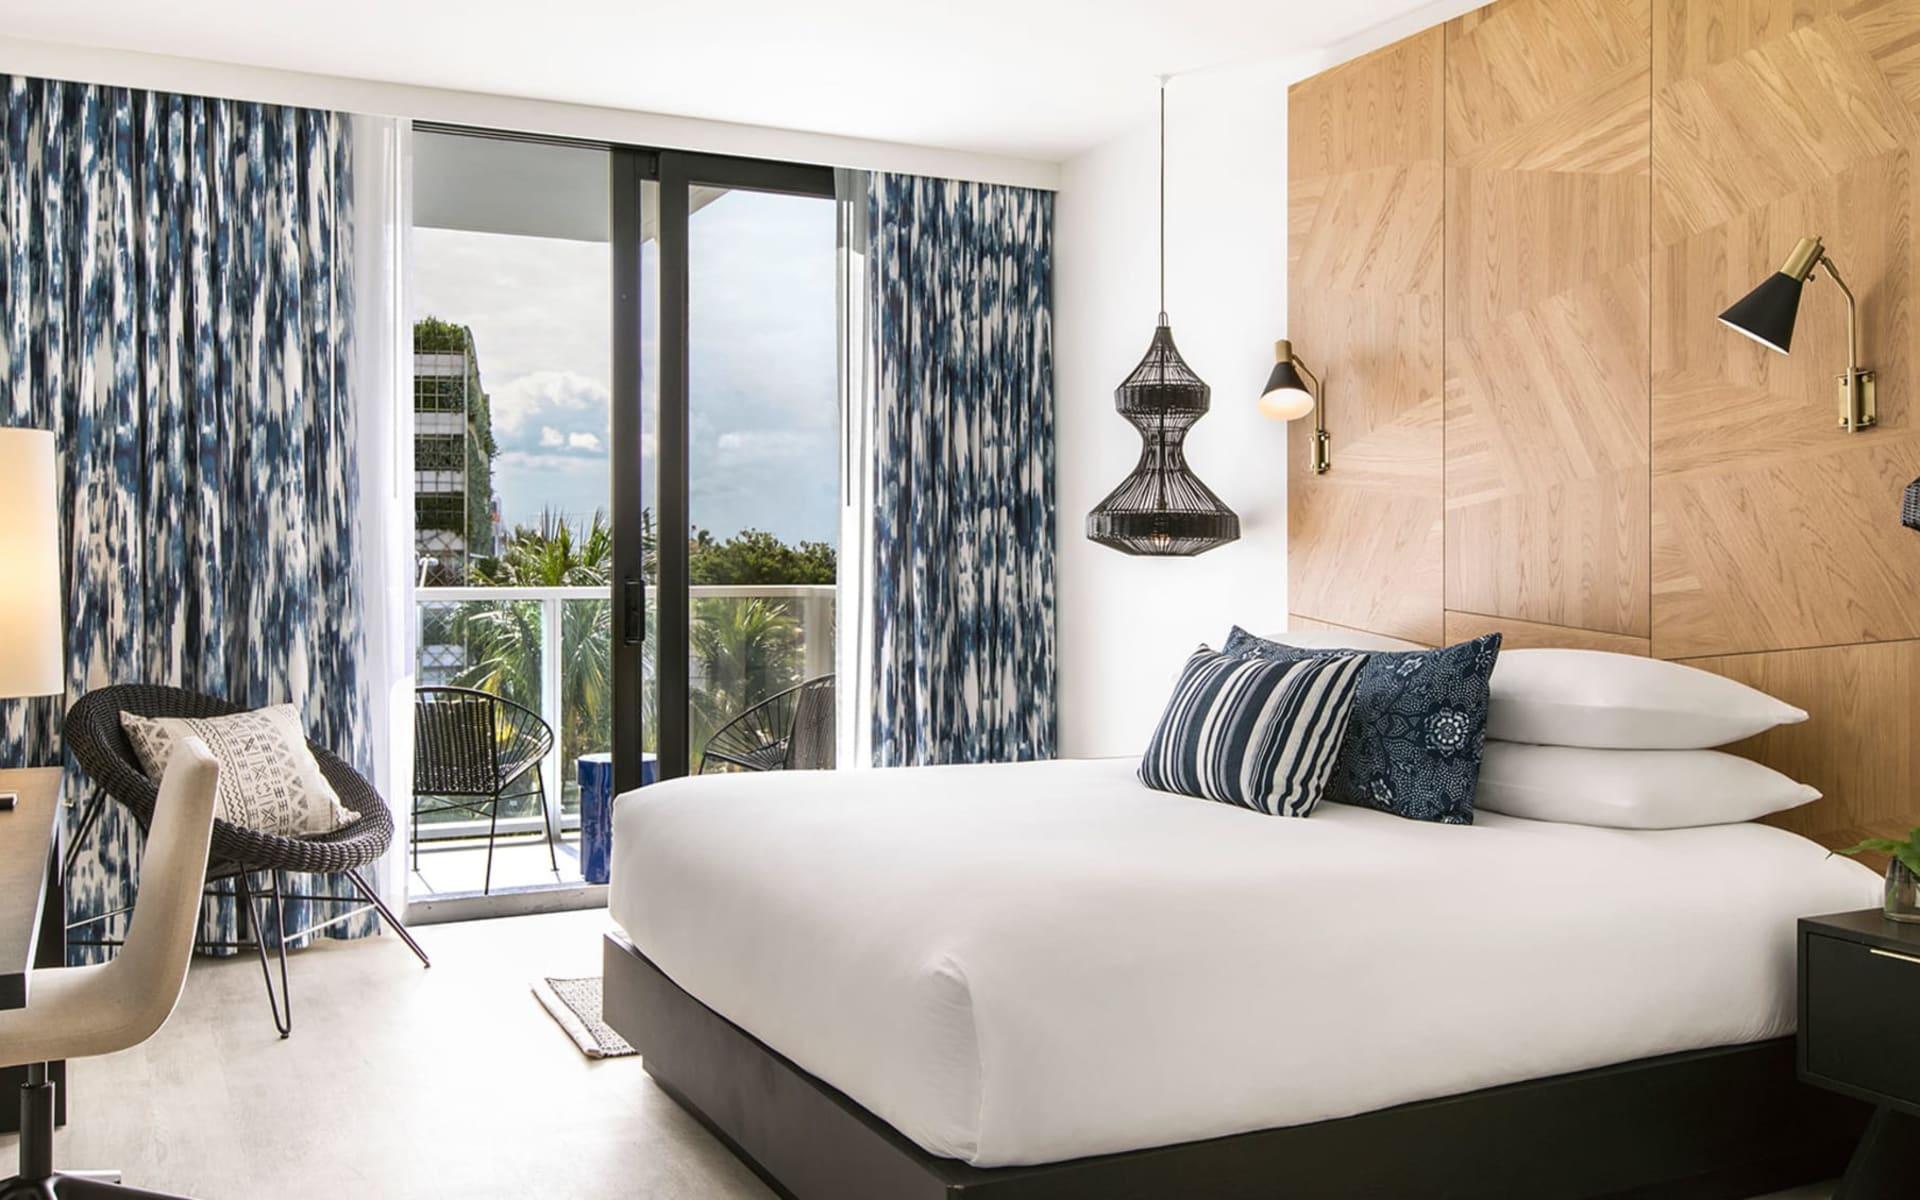 Kimpton Angler's Hotel South Beach in Miami Beach:  The Anglers - Studio